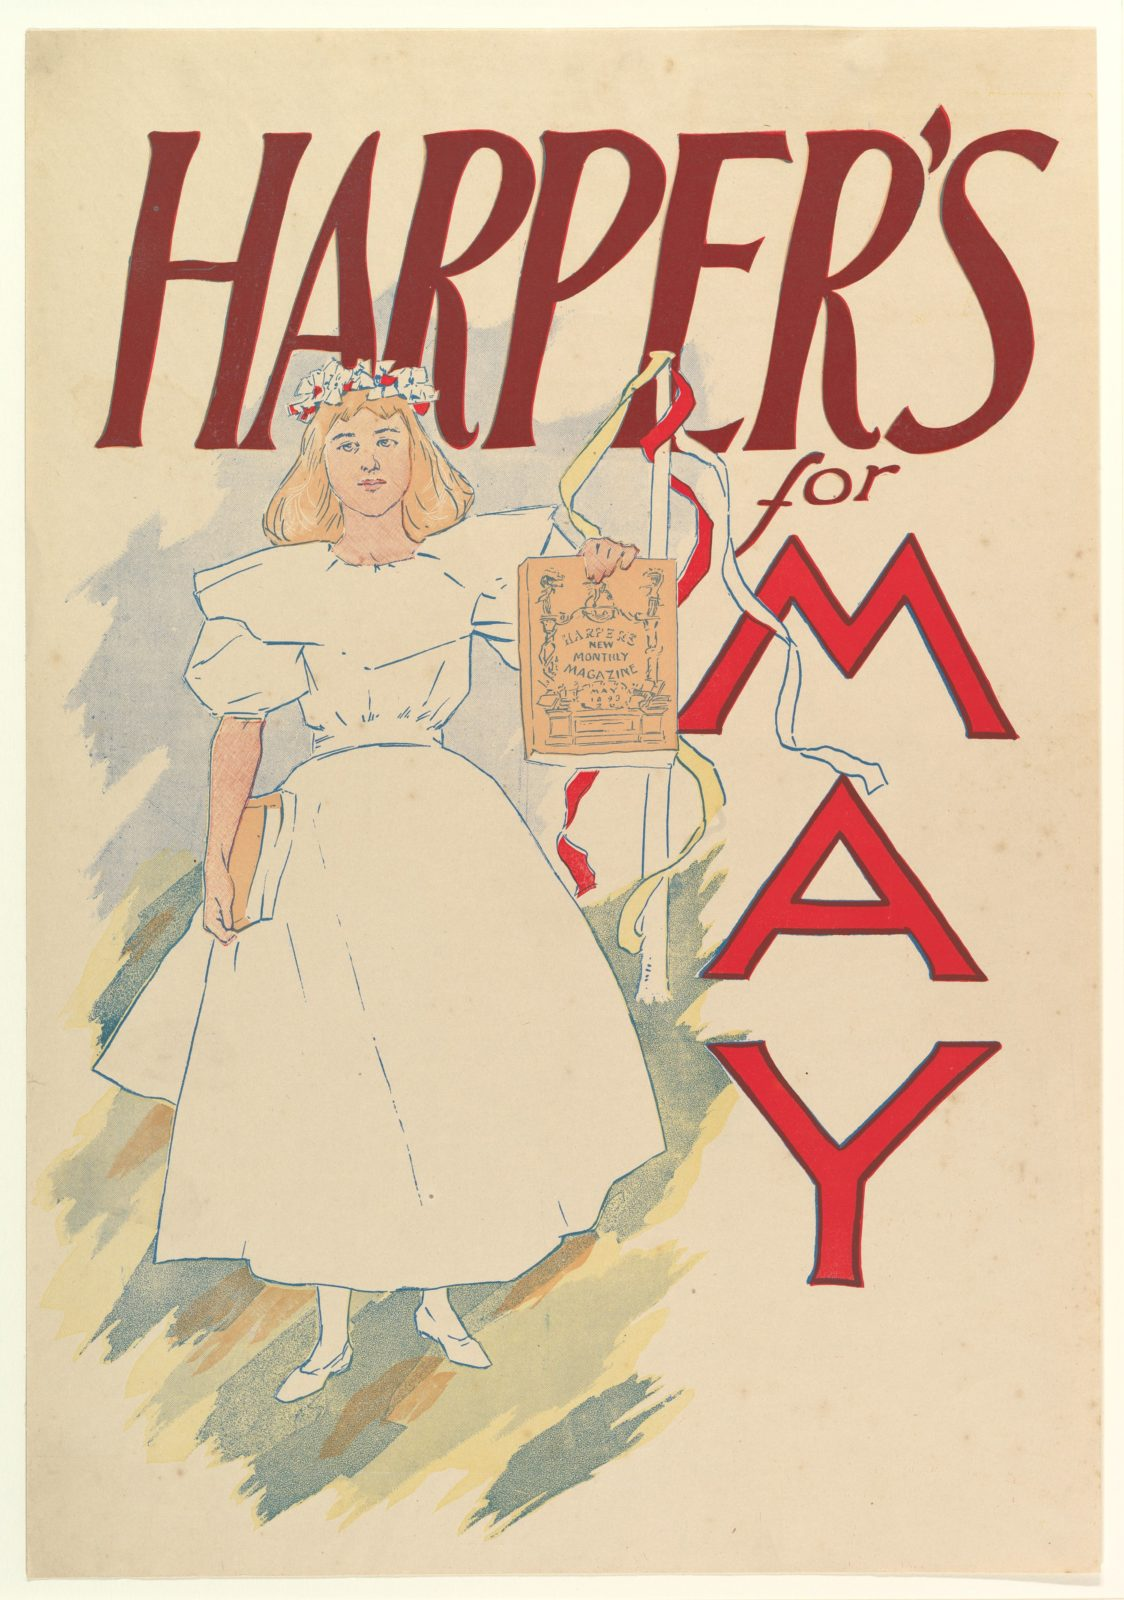 Harper's, May